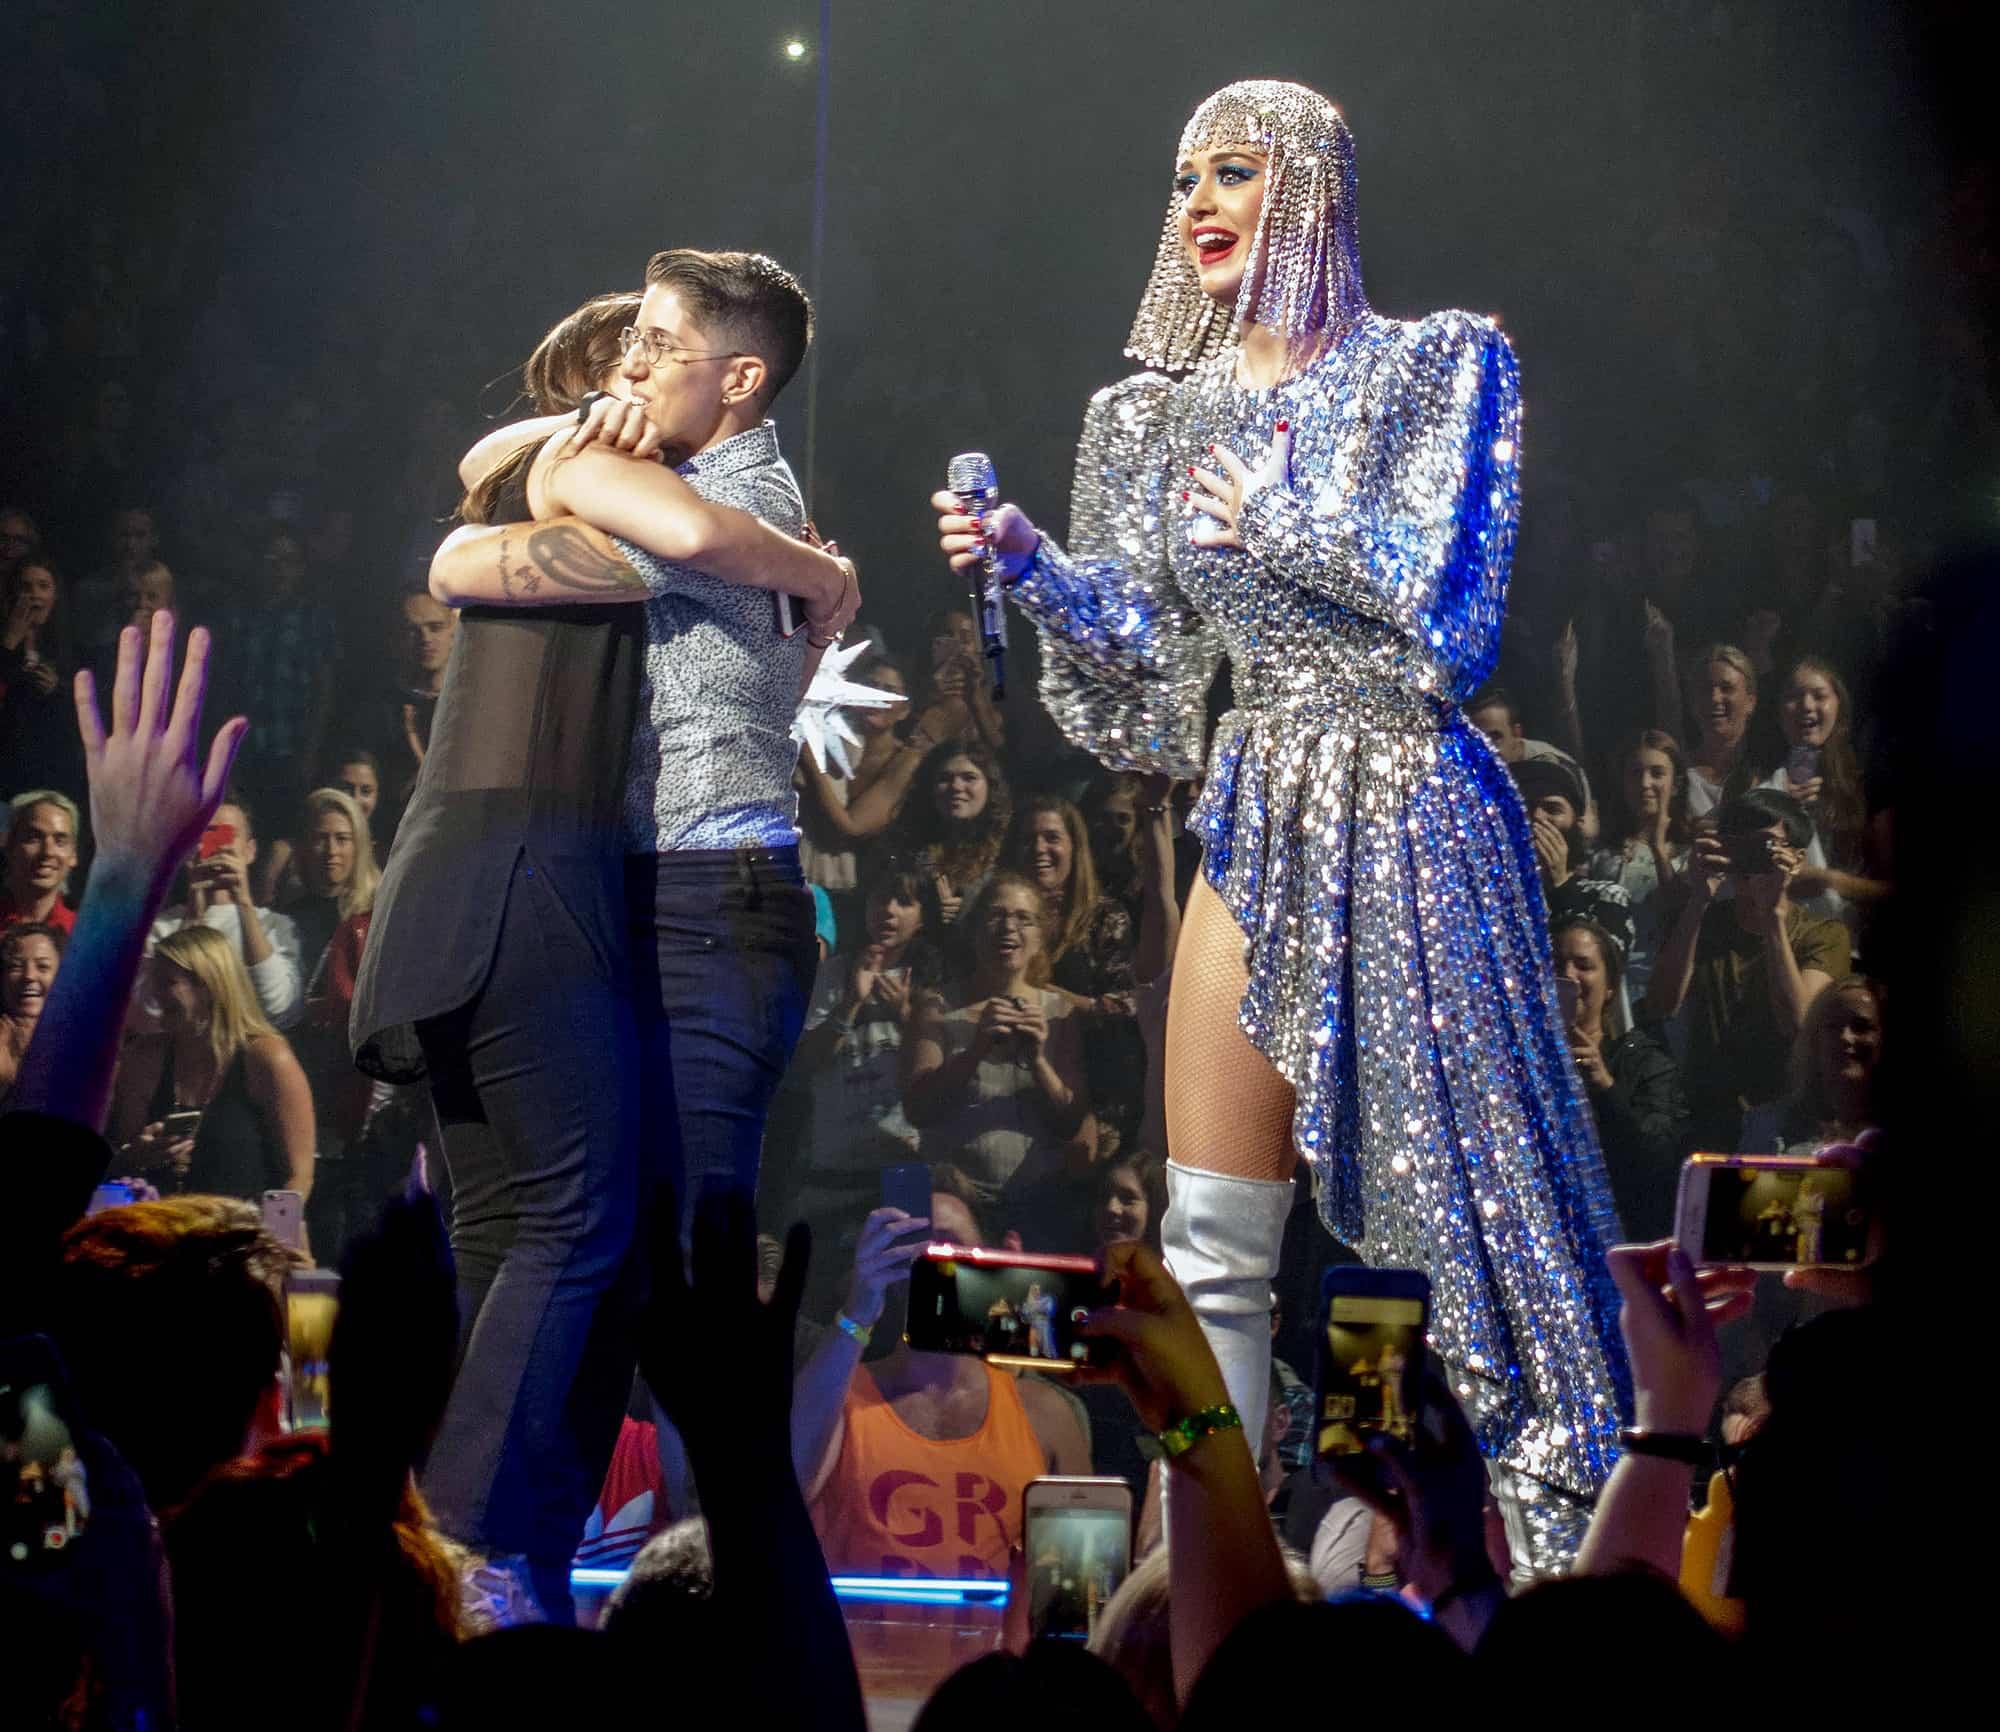 Lesbian Katy Perry, Hay una lesbiana en mi sopa